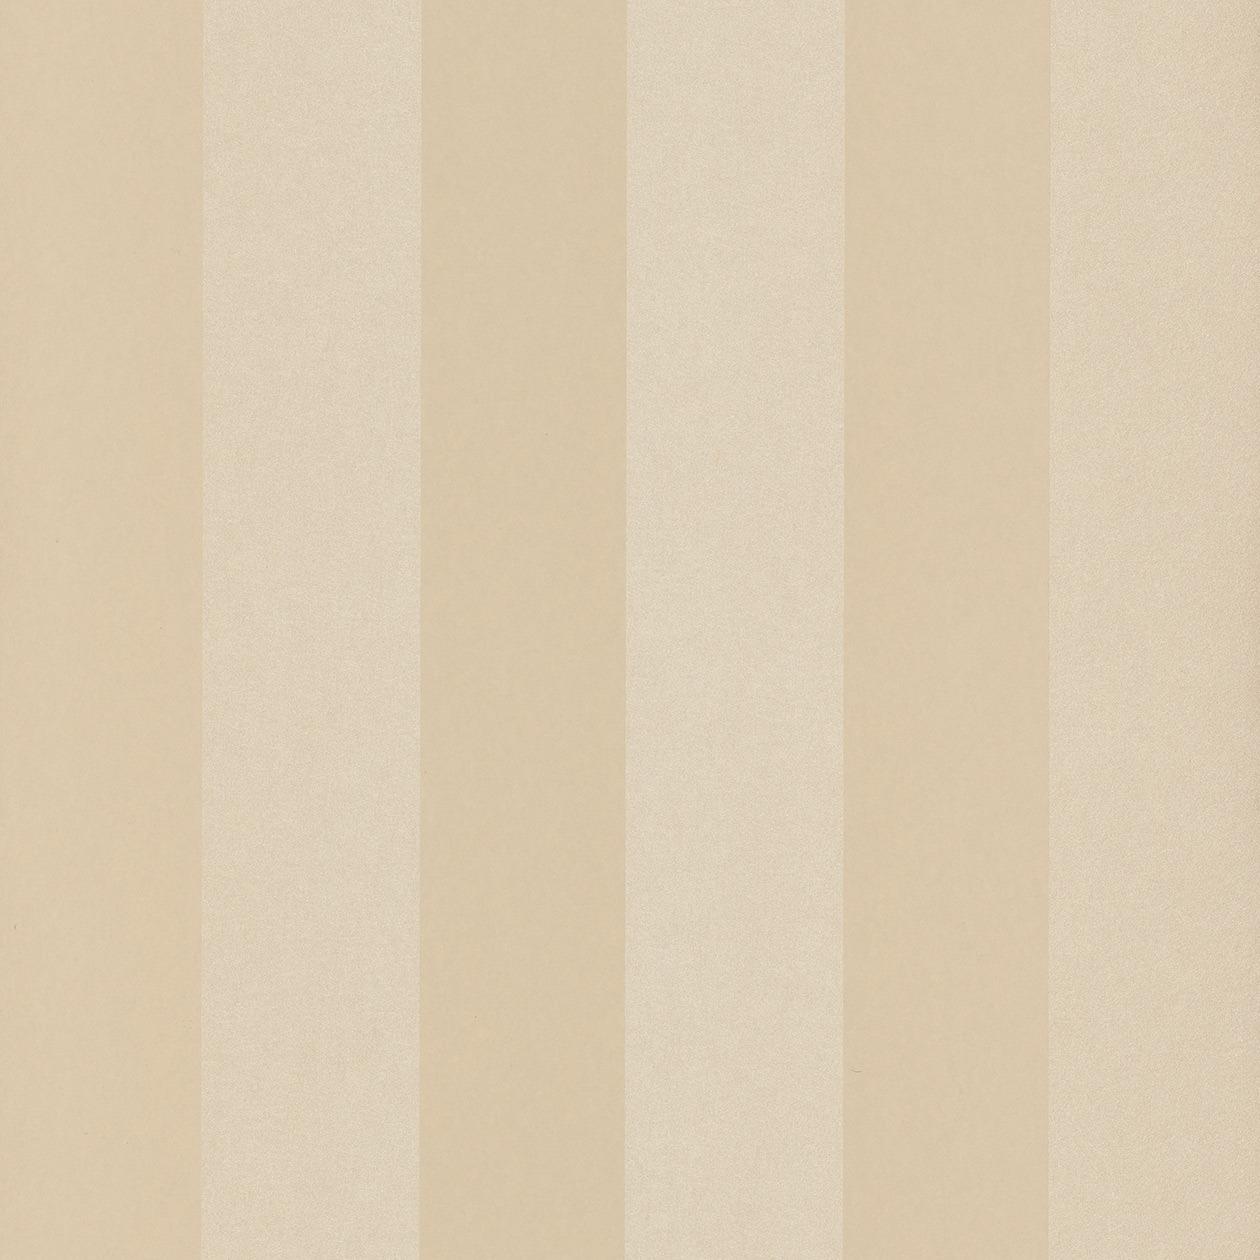 Французские обои Caselio,  коллекция Trio, артикулTIO68061028